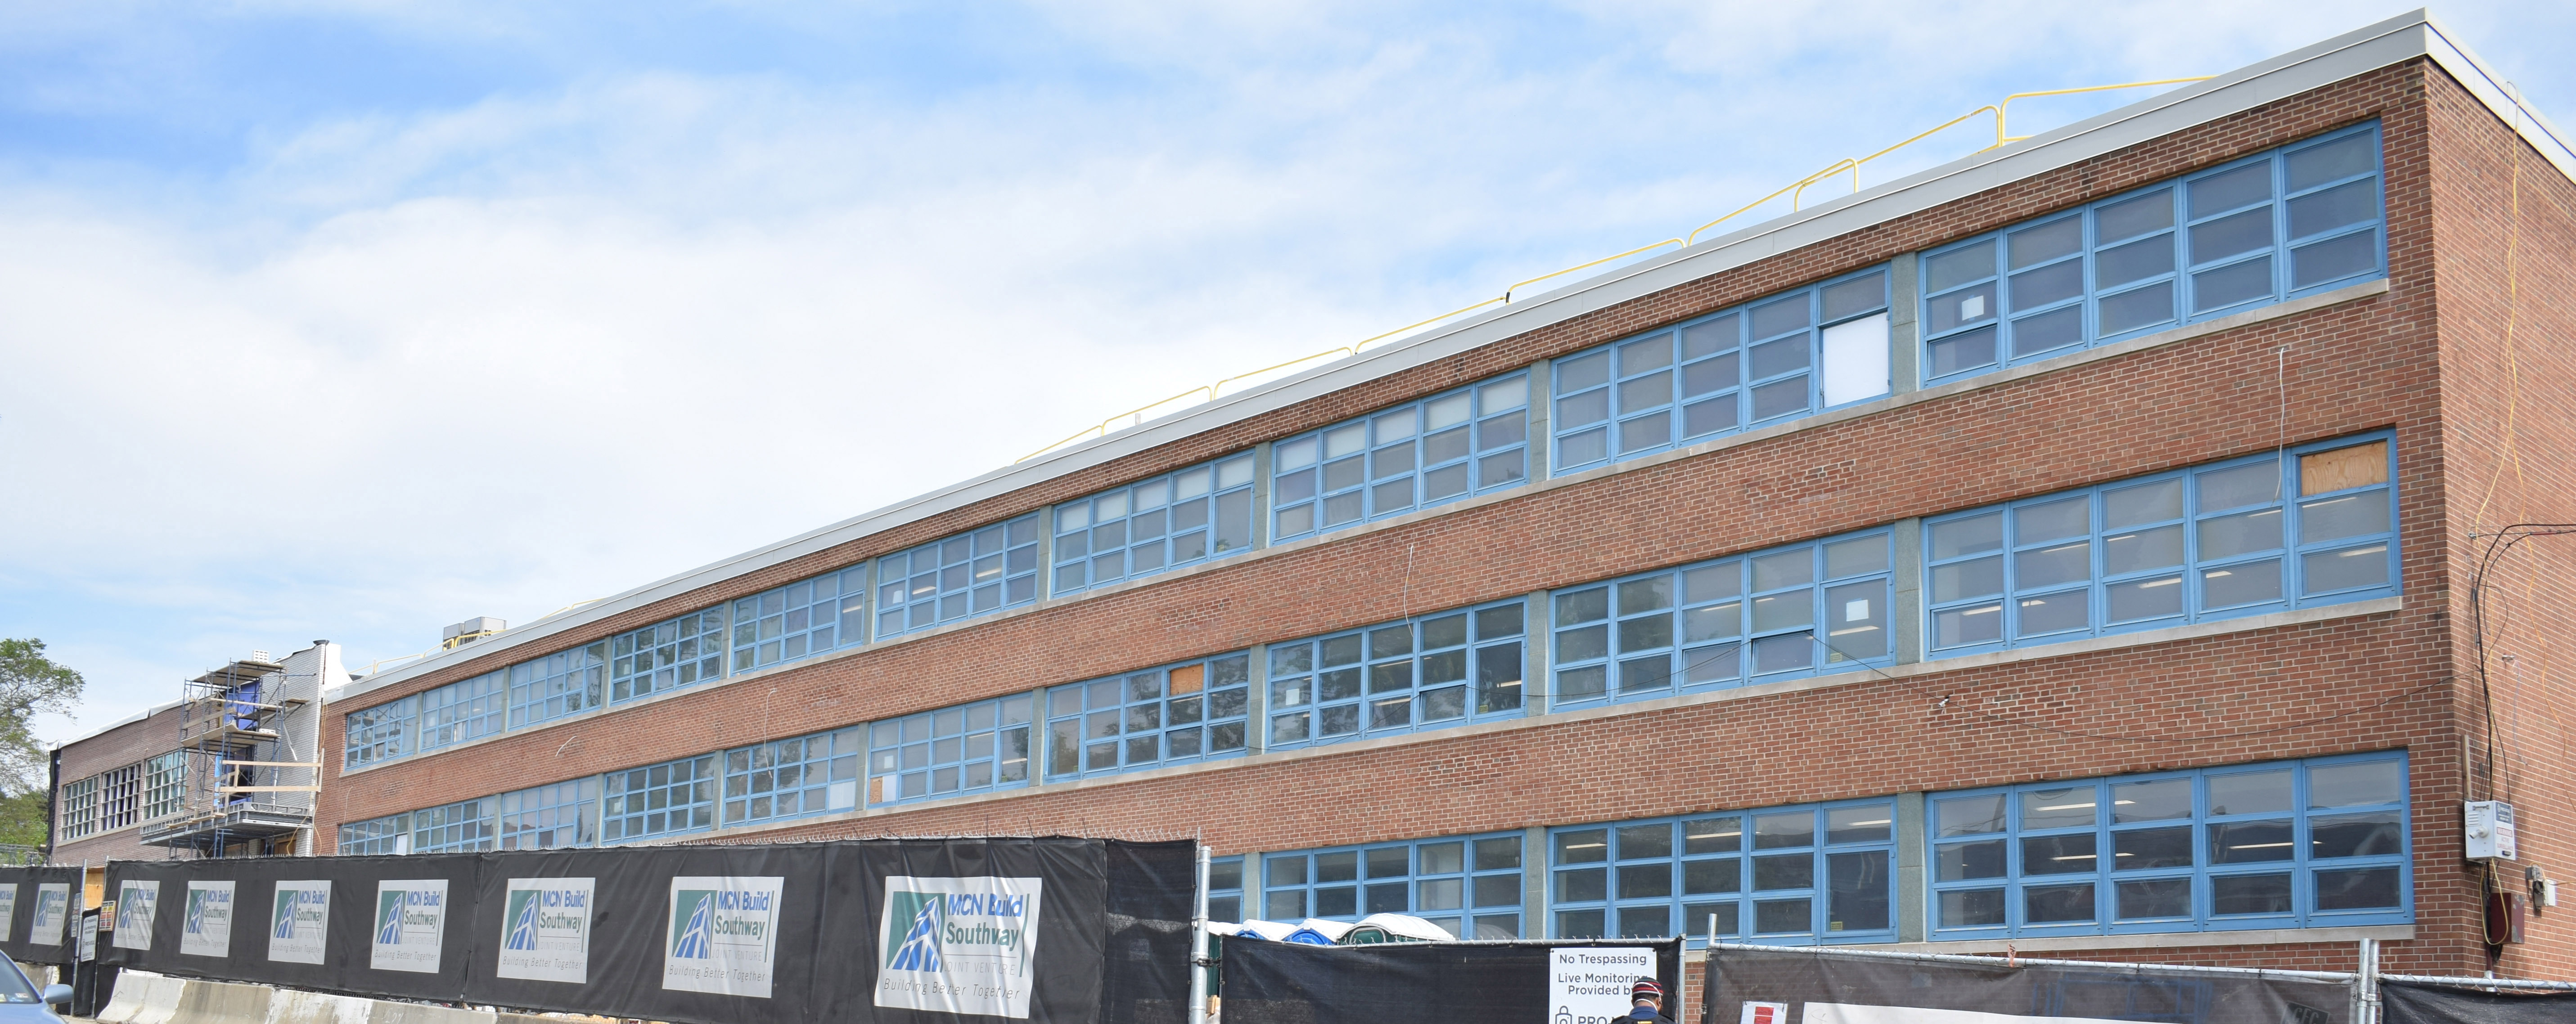 Mary E. Rodman Elementary School construction site